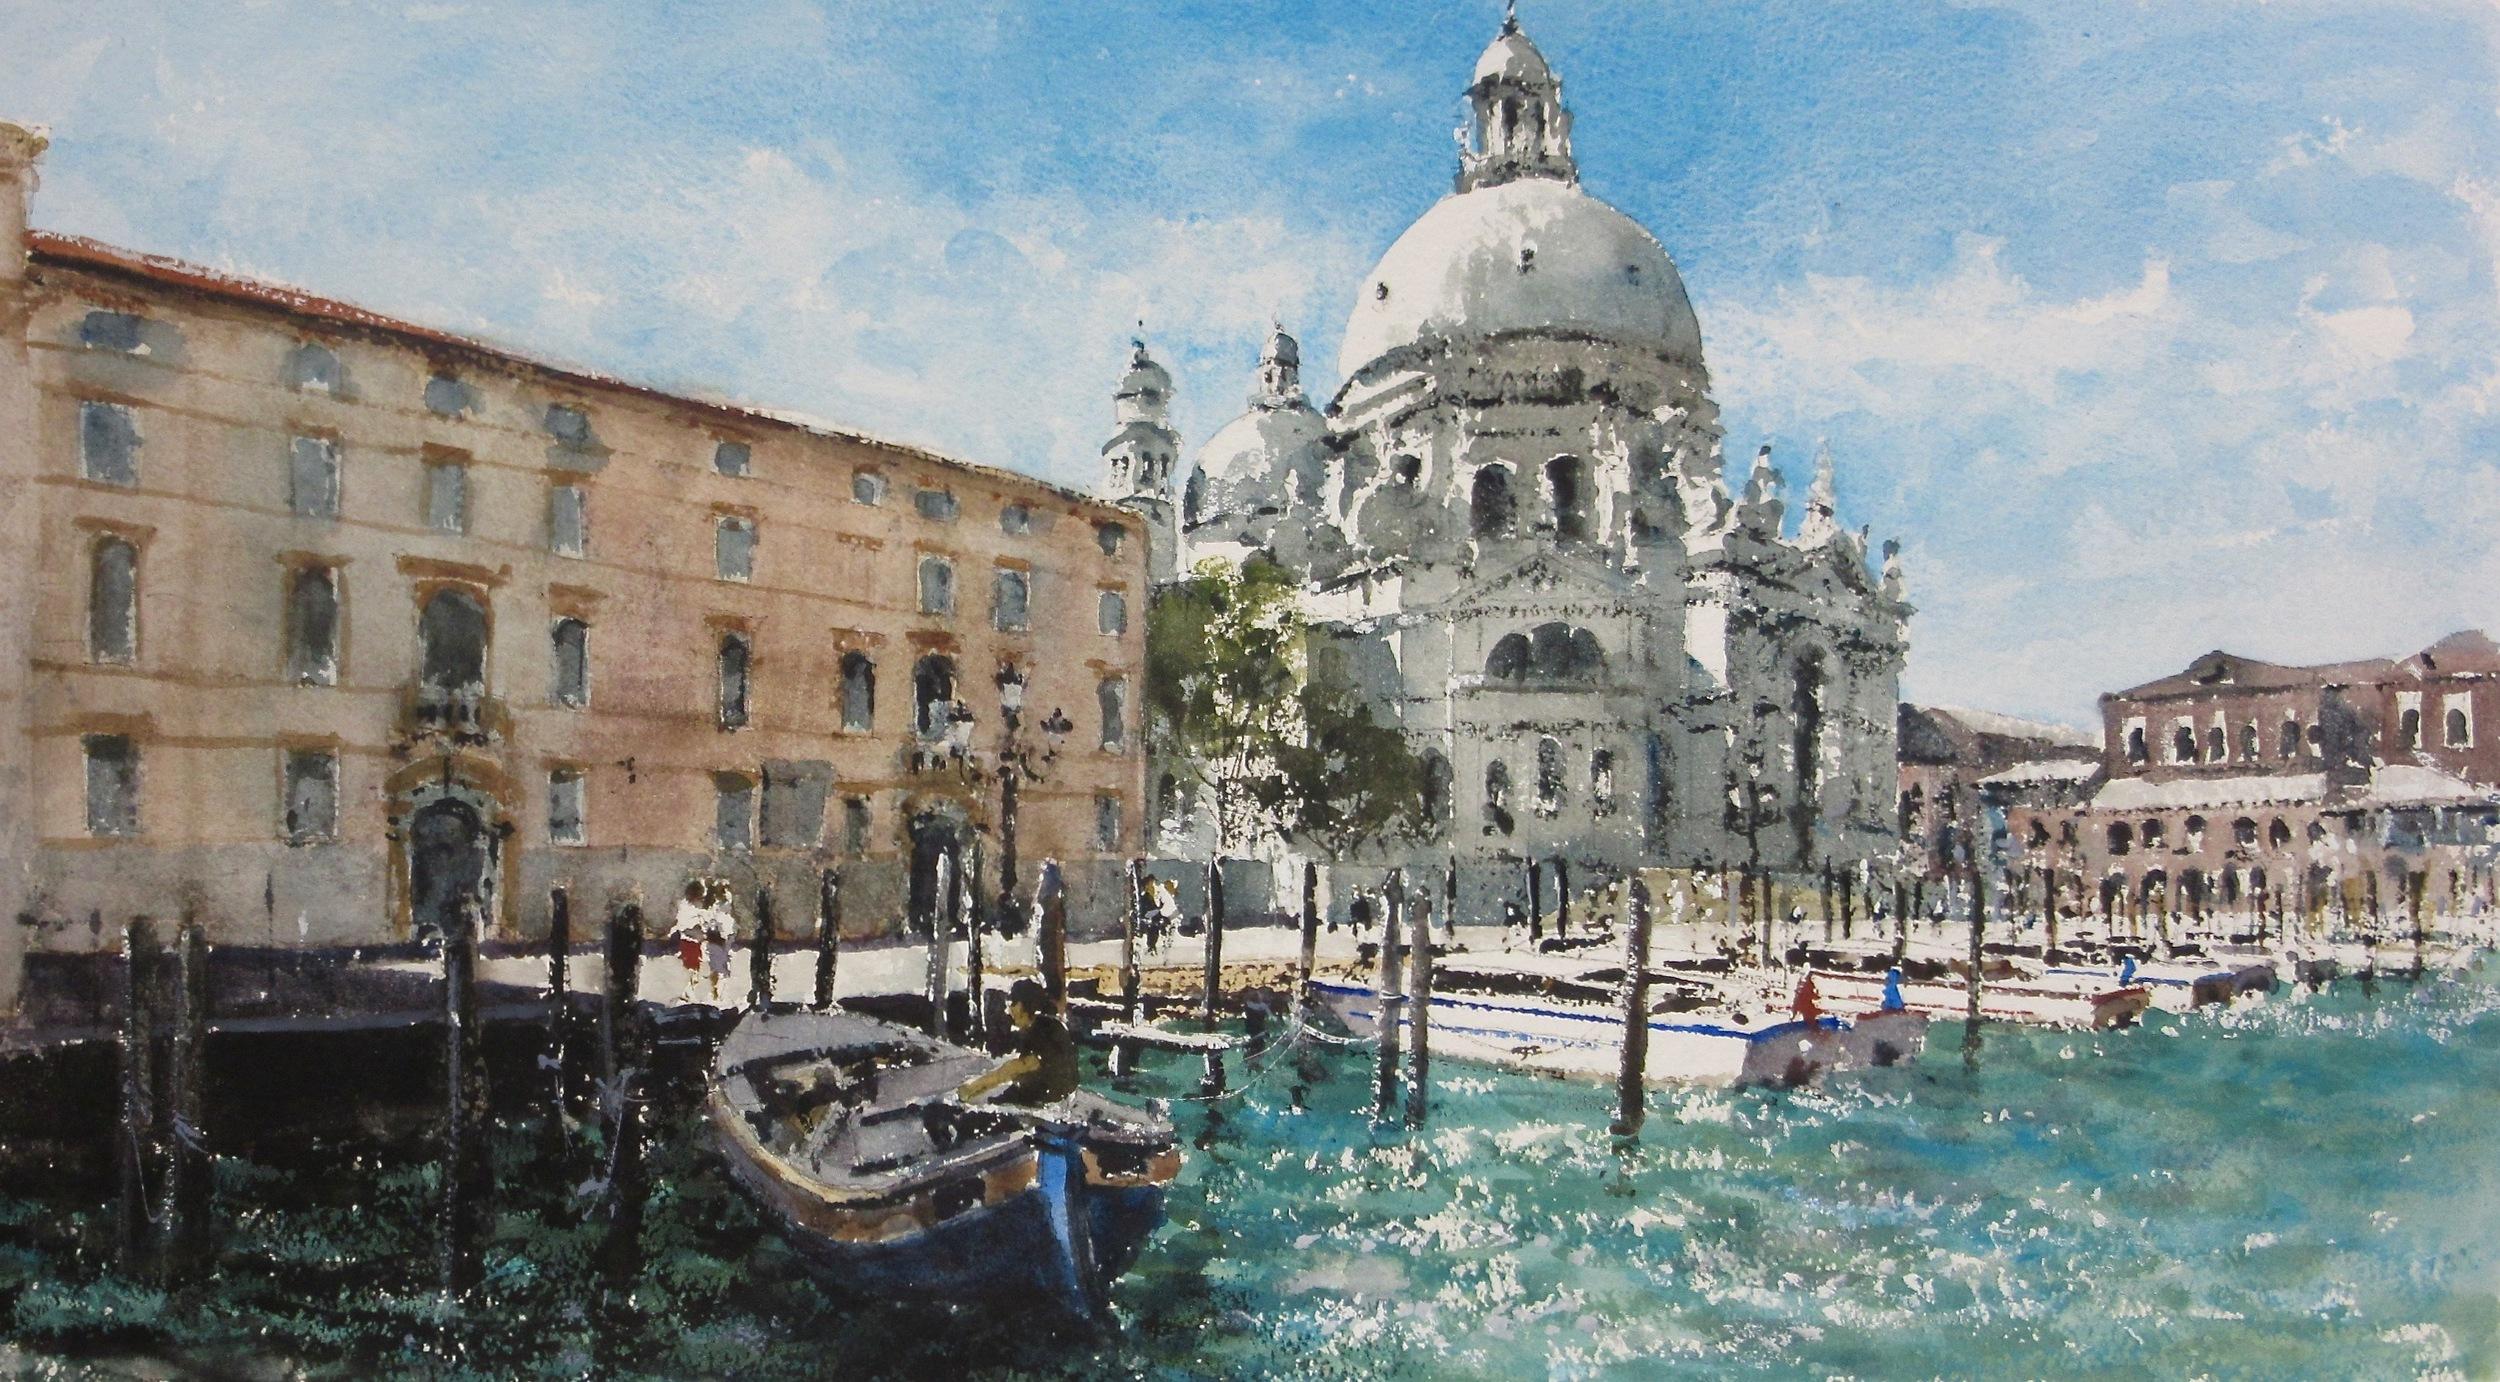 Salute Moorings Venice: 13 x 24 in: SOLD